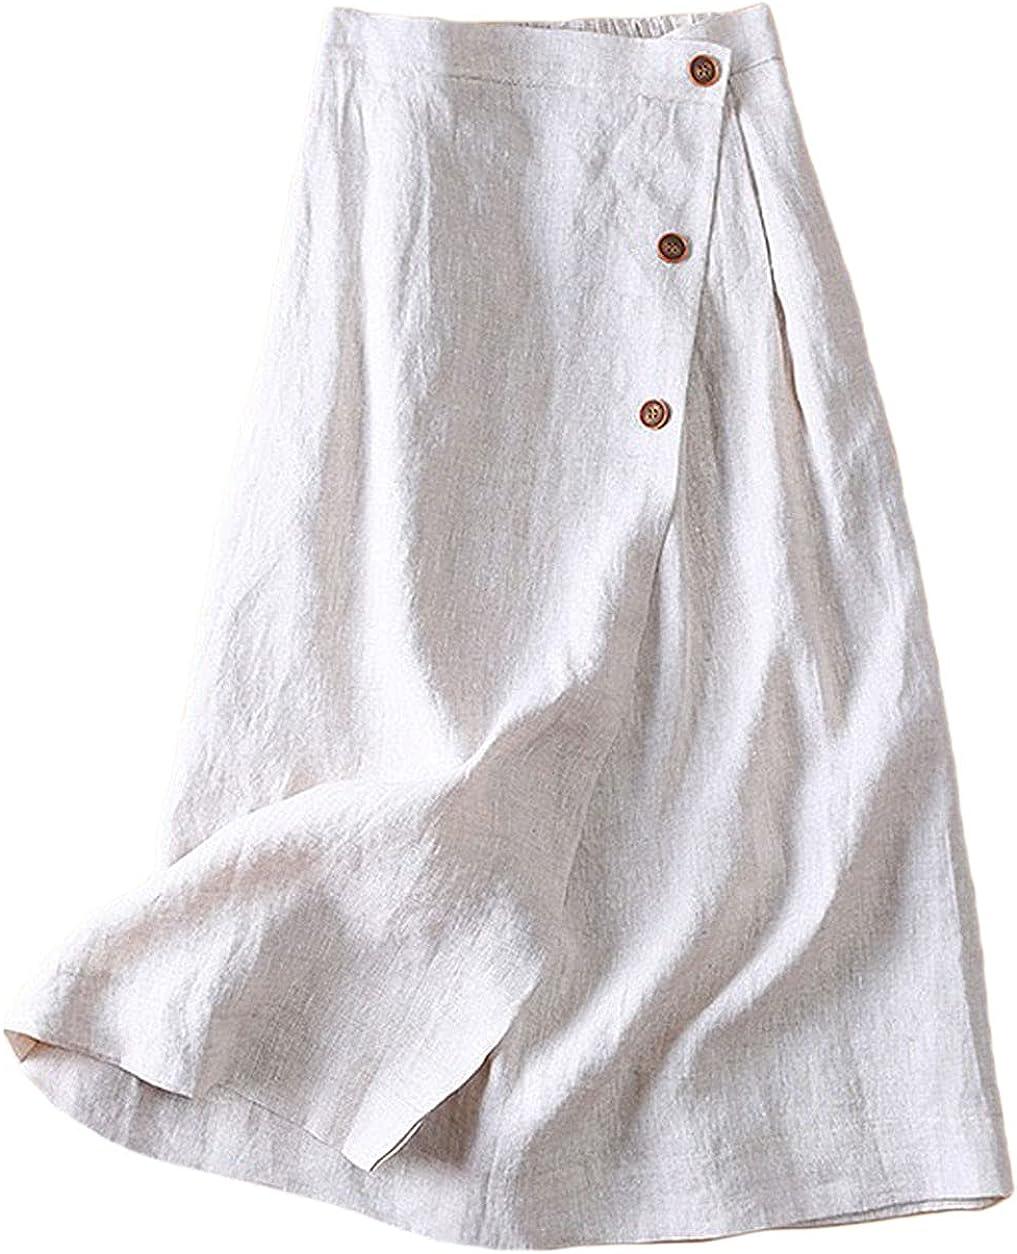 CHARTOU Women's Summer Linen Cotton Elastic Back Buttoned Swing Midi A Line Skirt